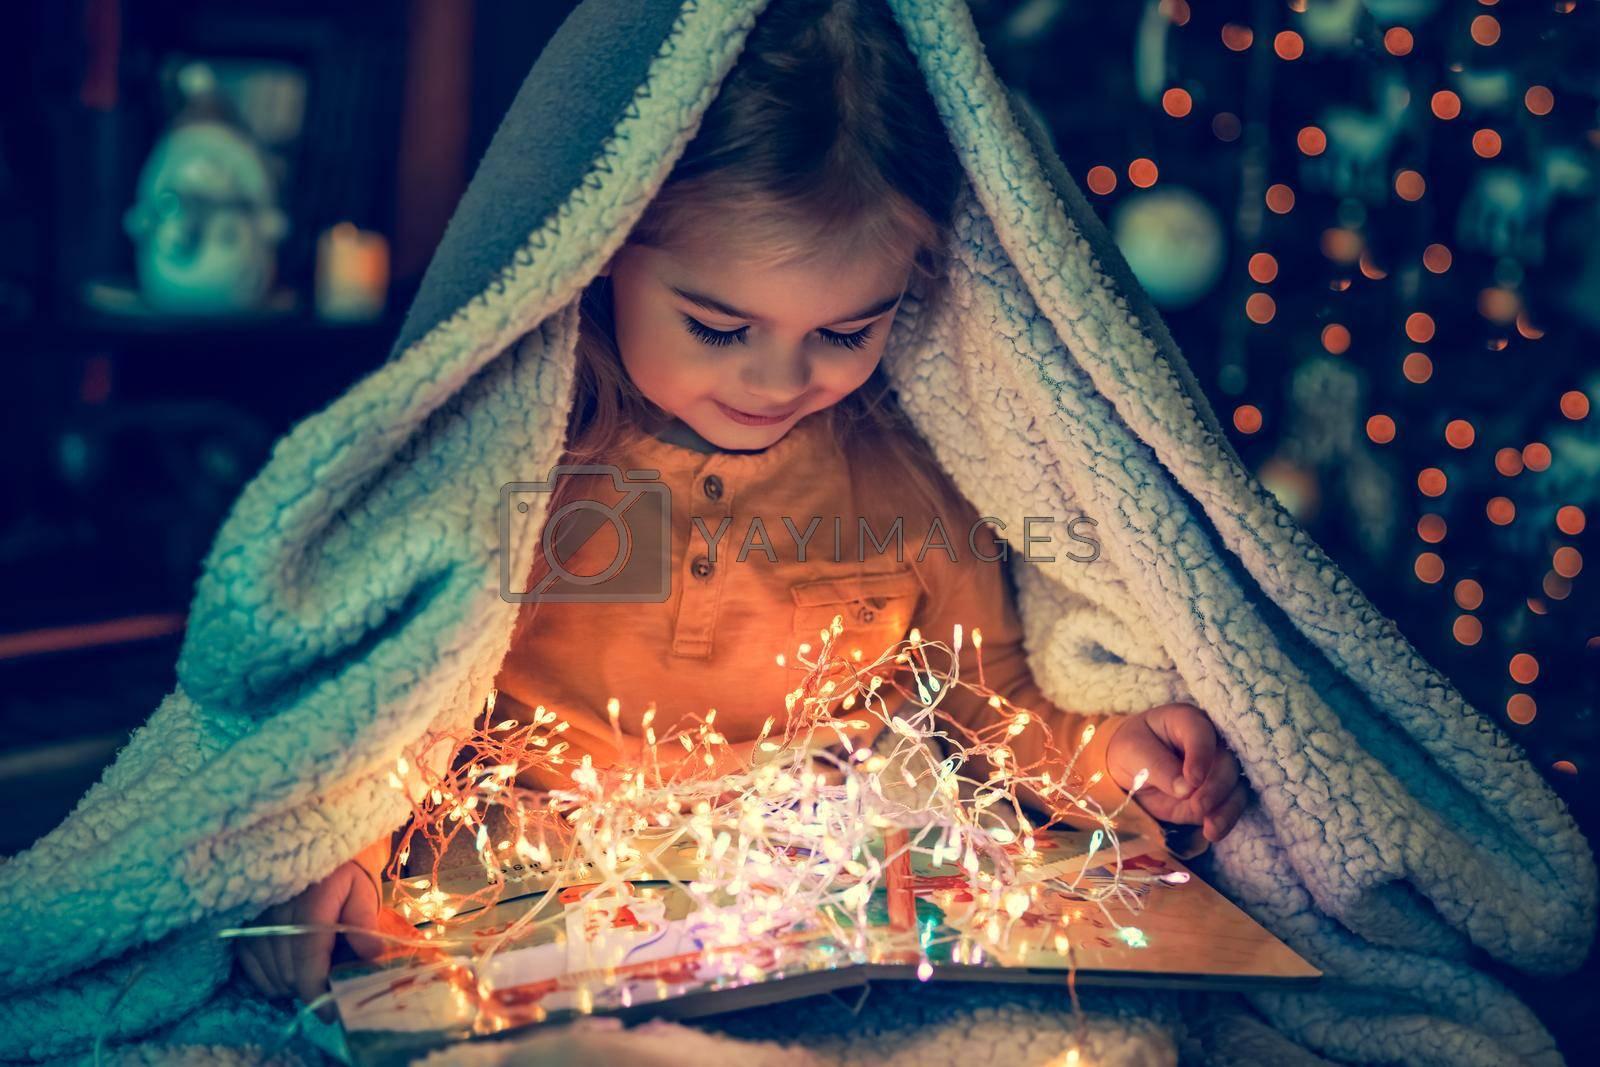 Cute Little Baby Reading Magic Christmas Tale. Kid Enjoying Beautiful Cozy Christmas Eve at Home. Hygge Mood.